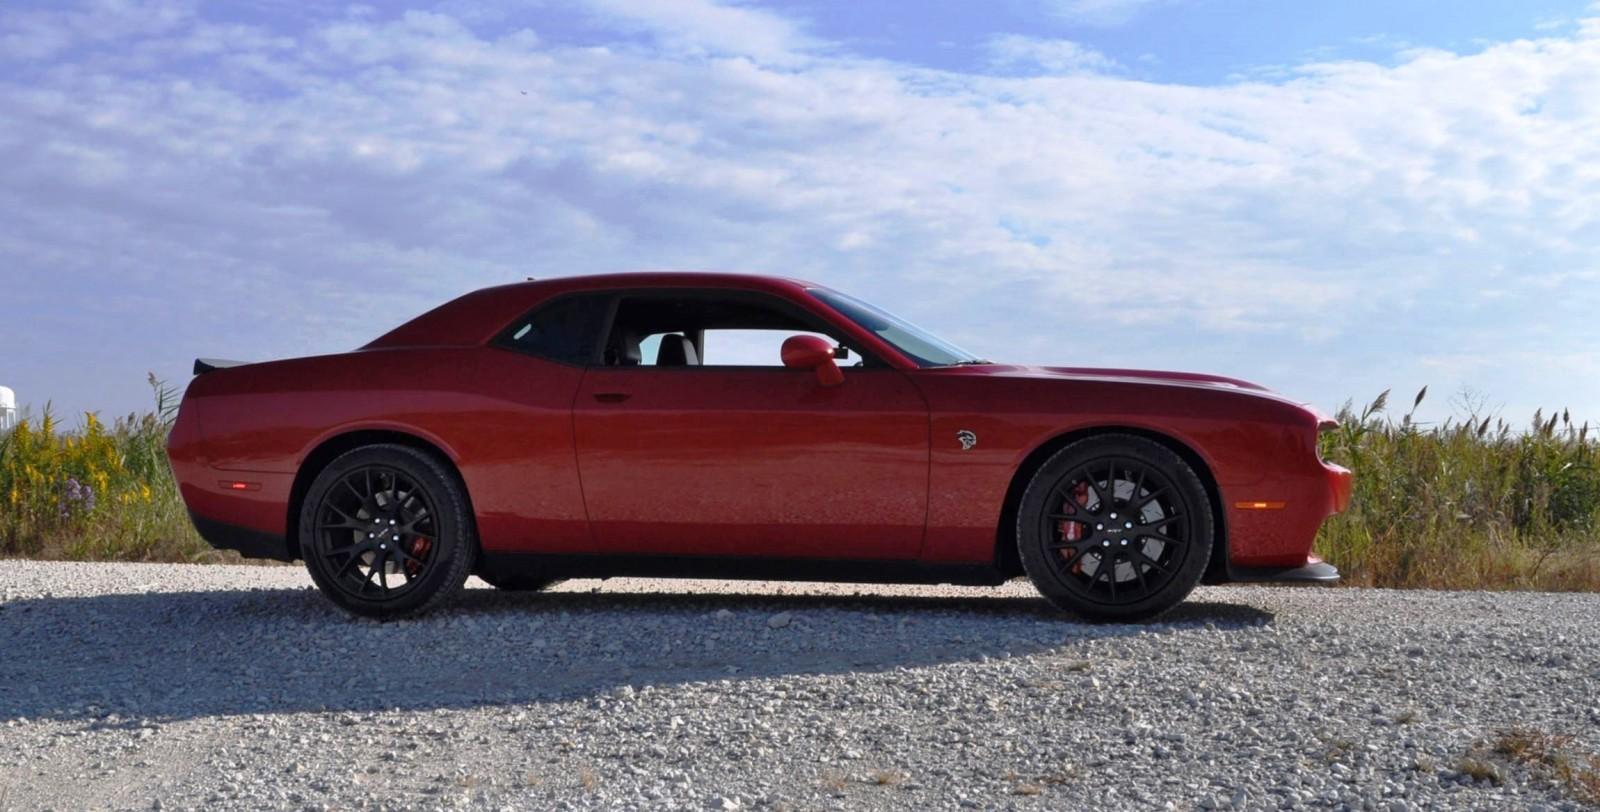 2015 Dodge Challenger Srt Hellcat Road Test | suporter.info